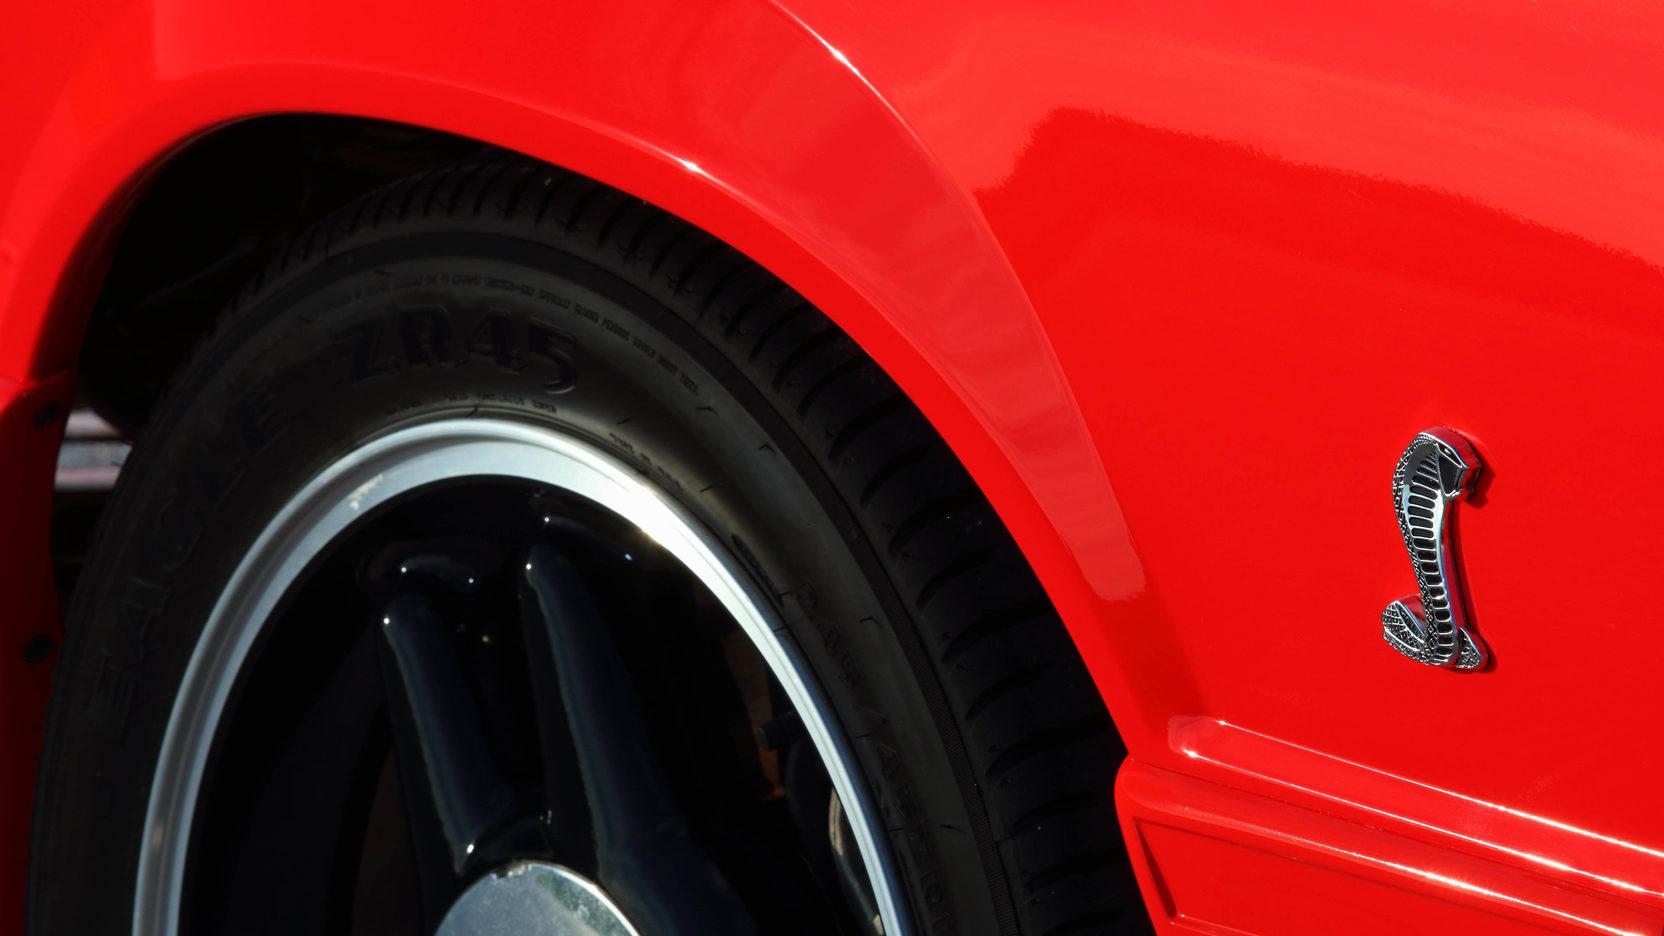 1993 Ford Mustang SVT Cobra R wheel and badge